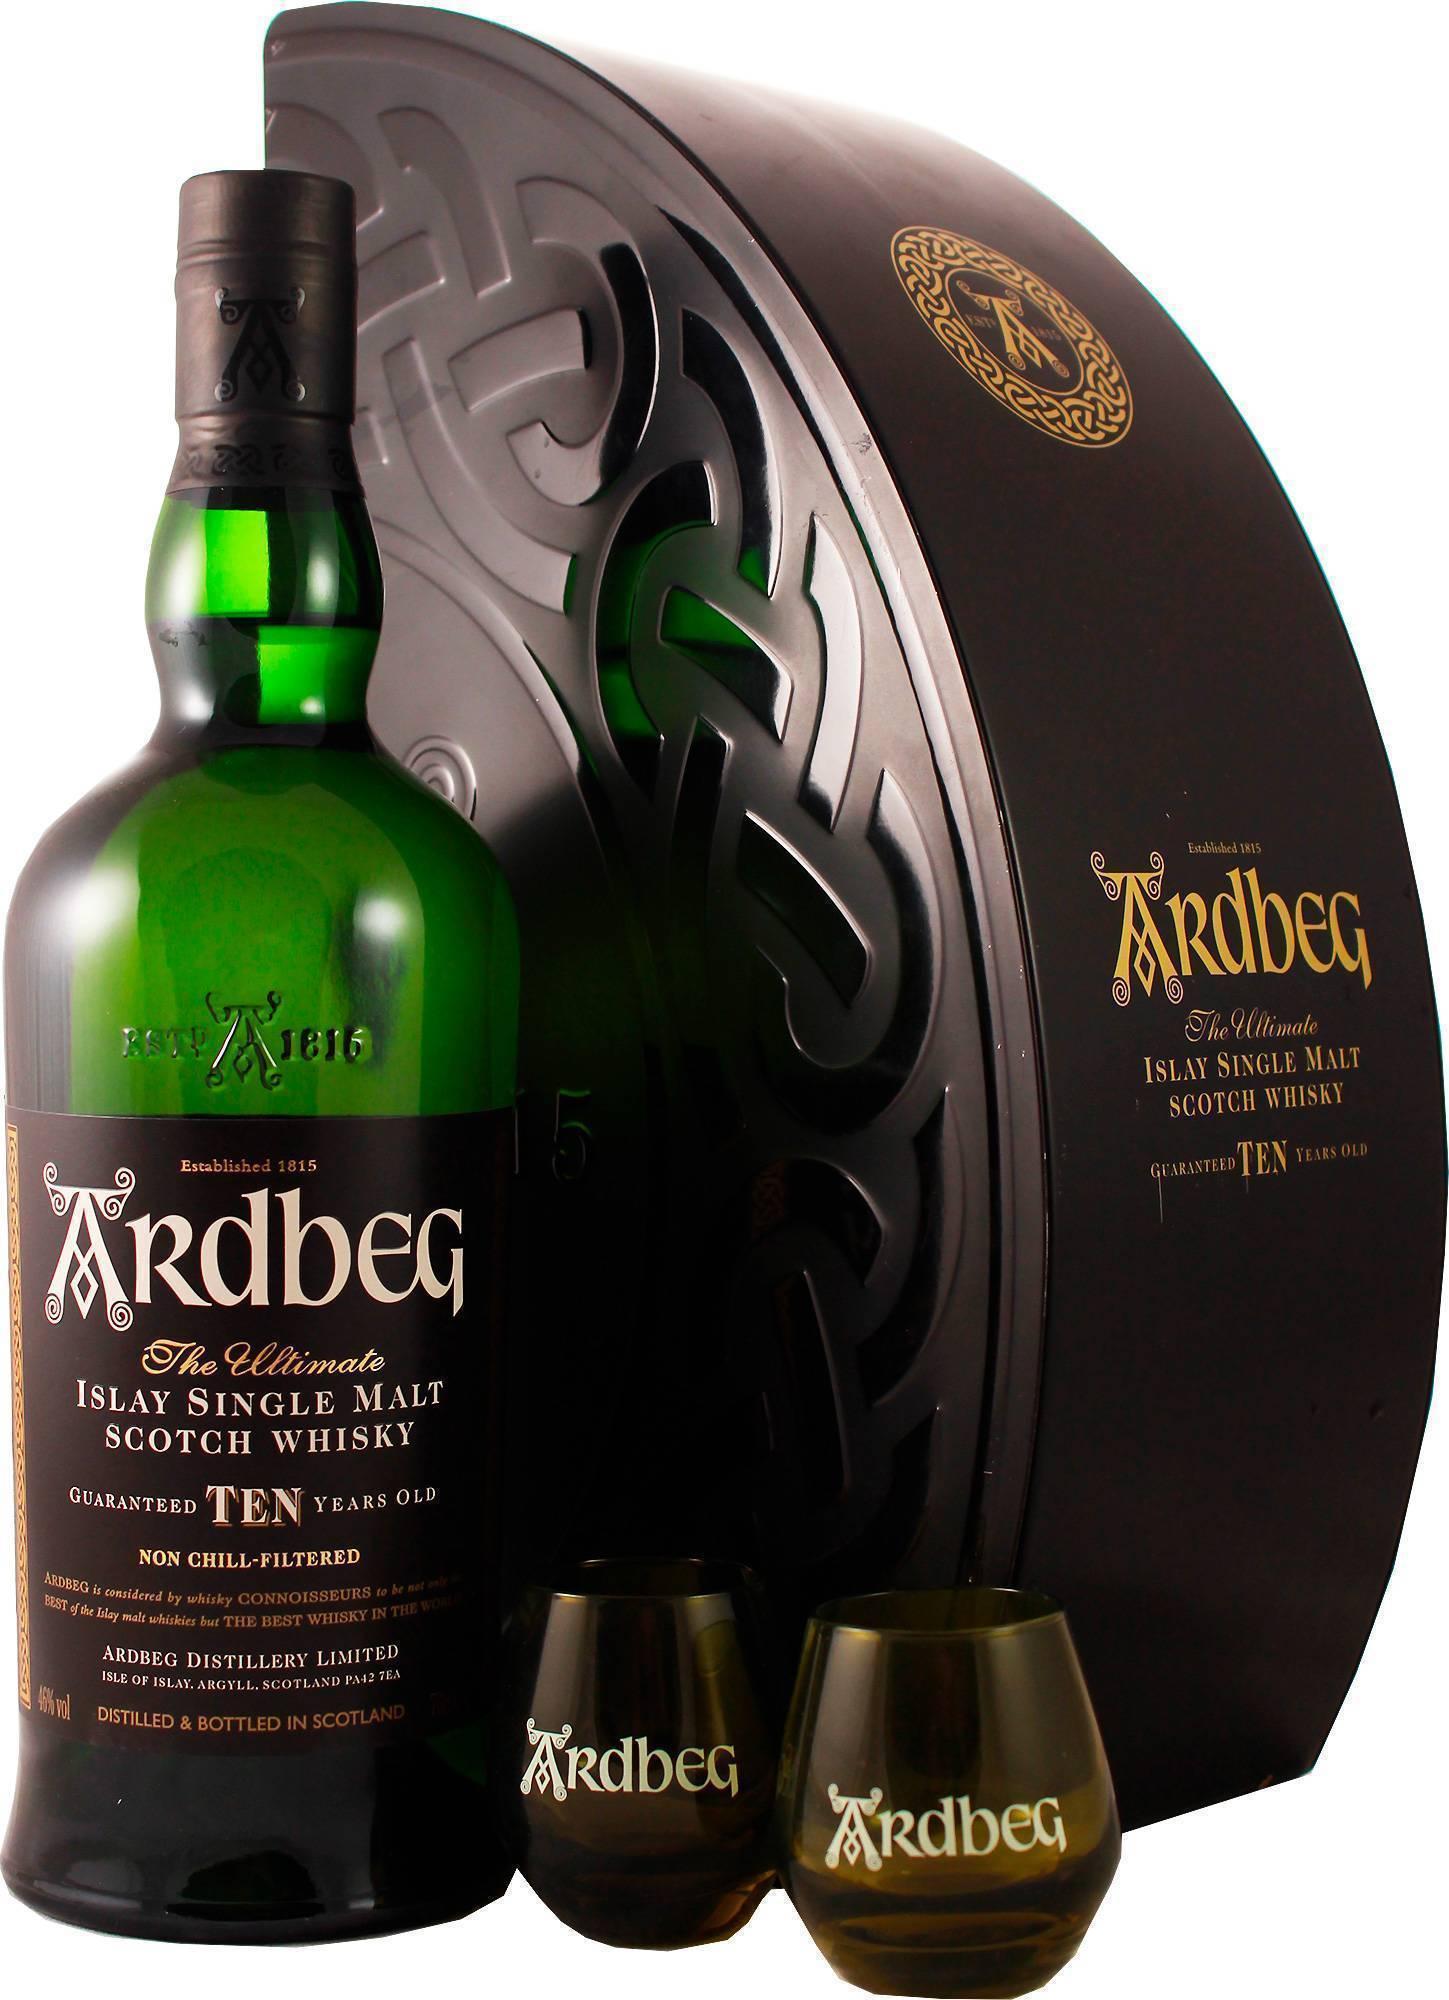 Ardbeg (виски) — википедия переиздание // wiki 2